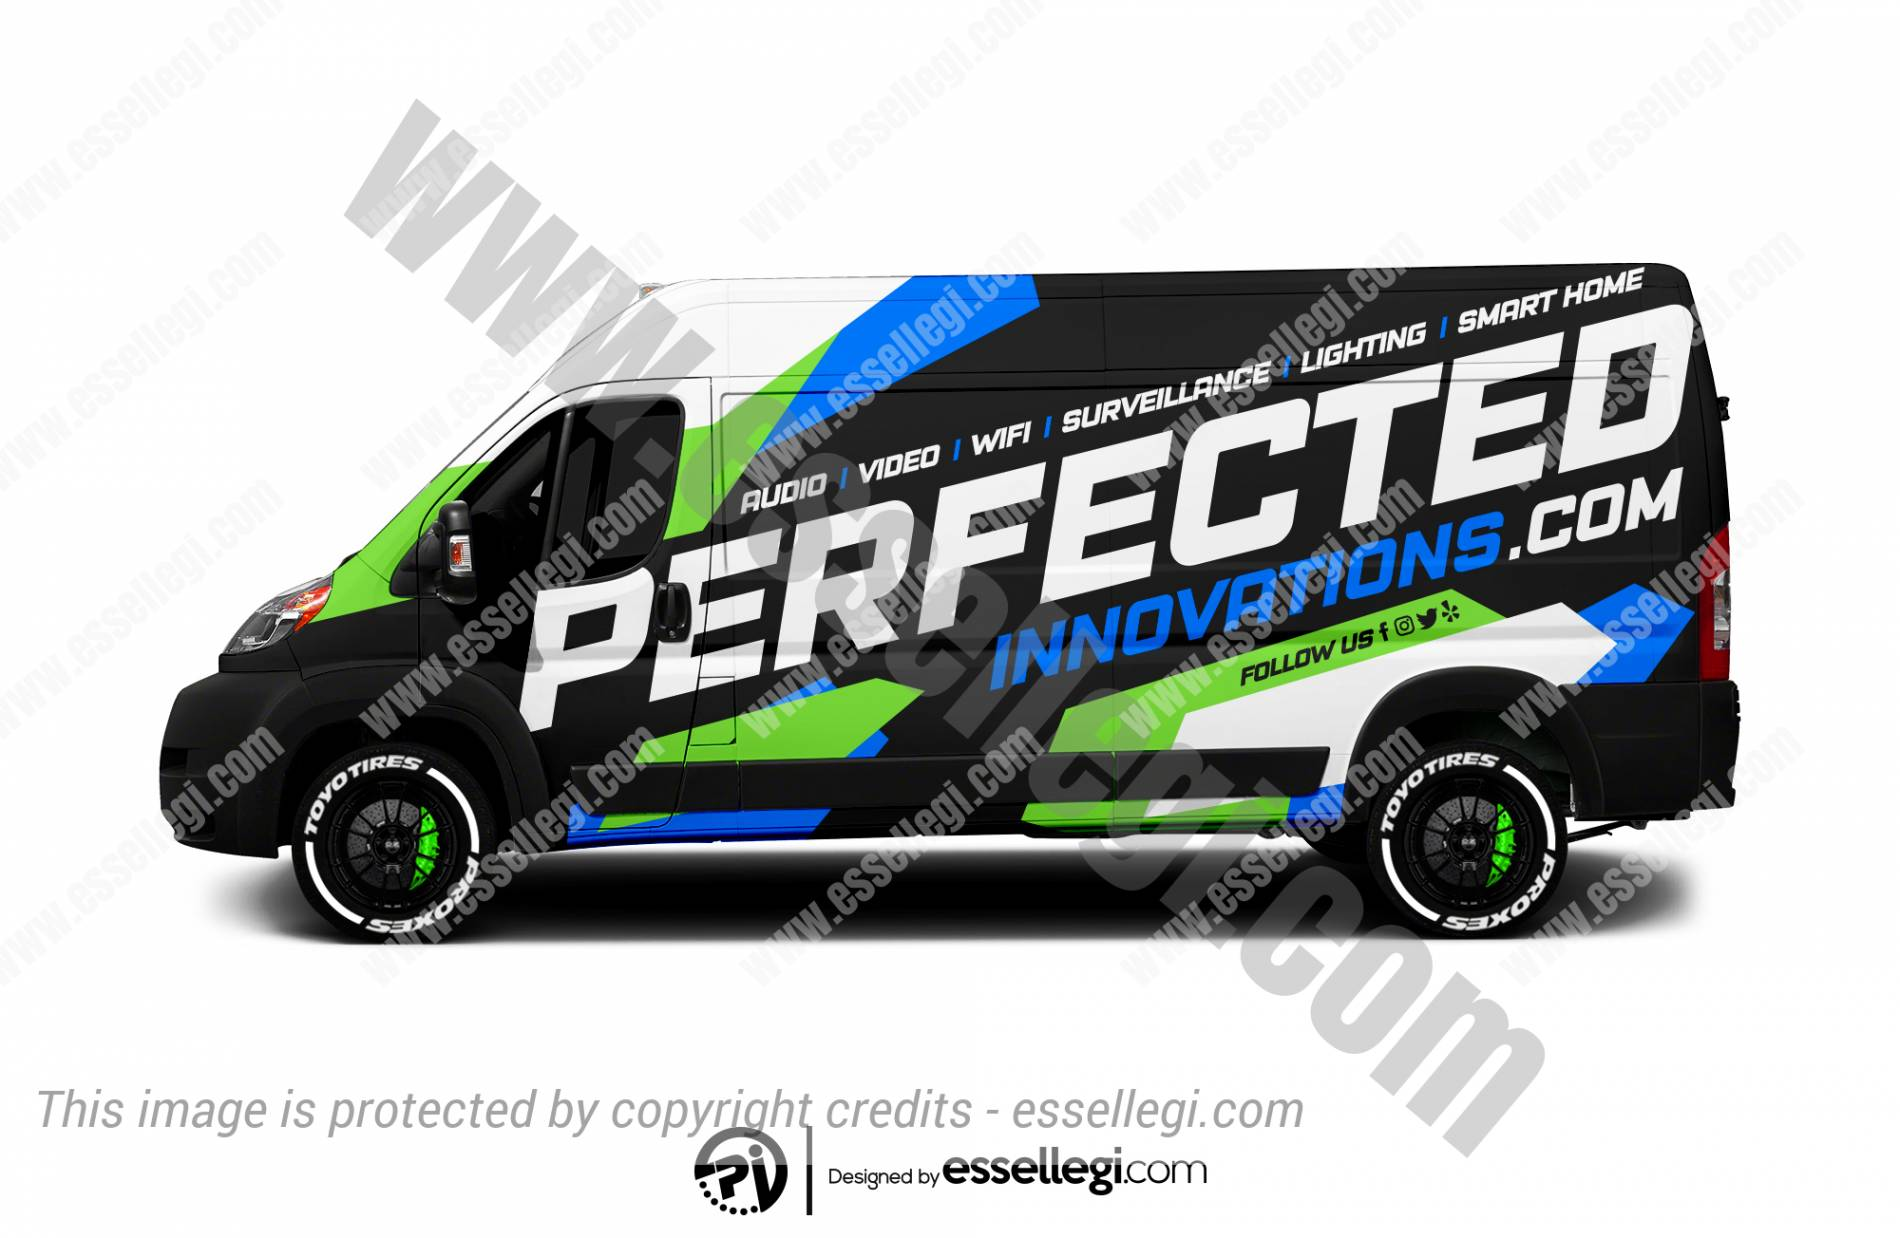 PERFECTED INNOVATIONS | VAN WRAP DESIGN 🇺🇸